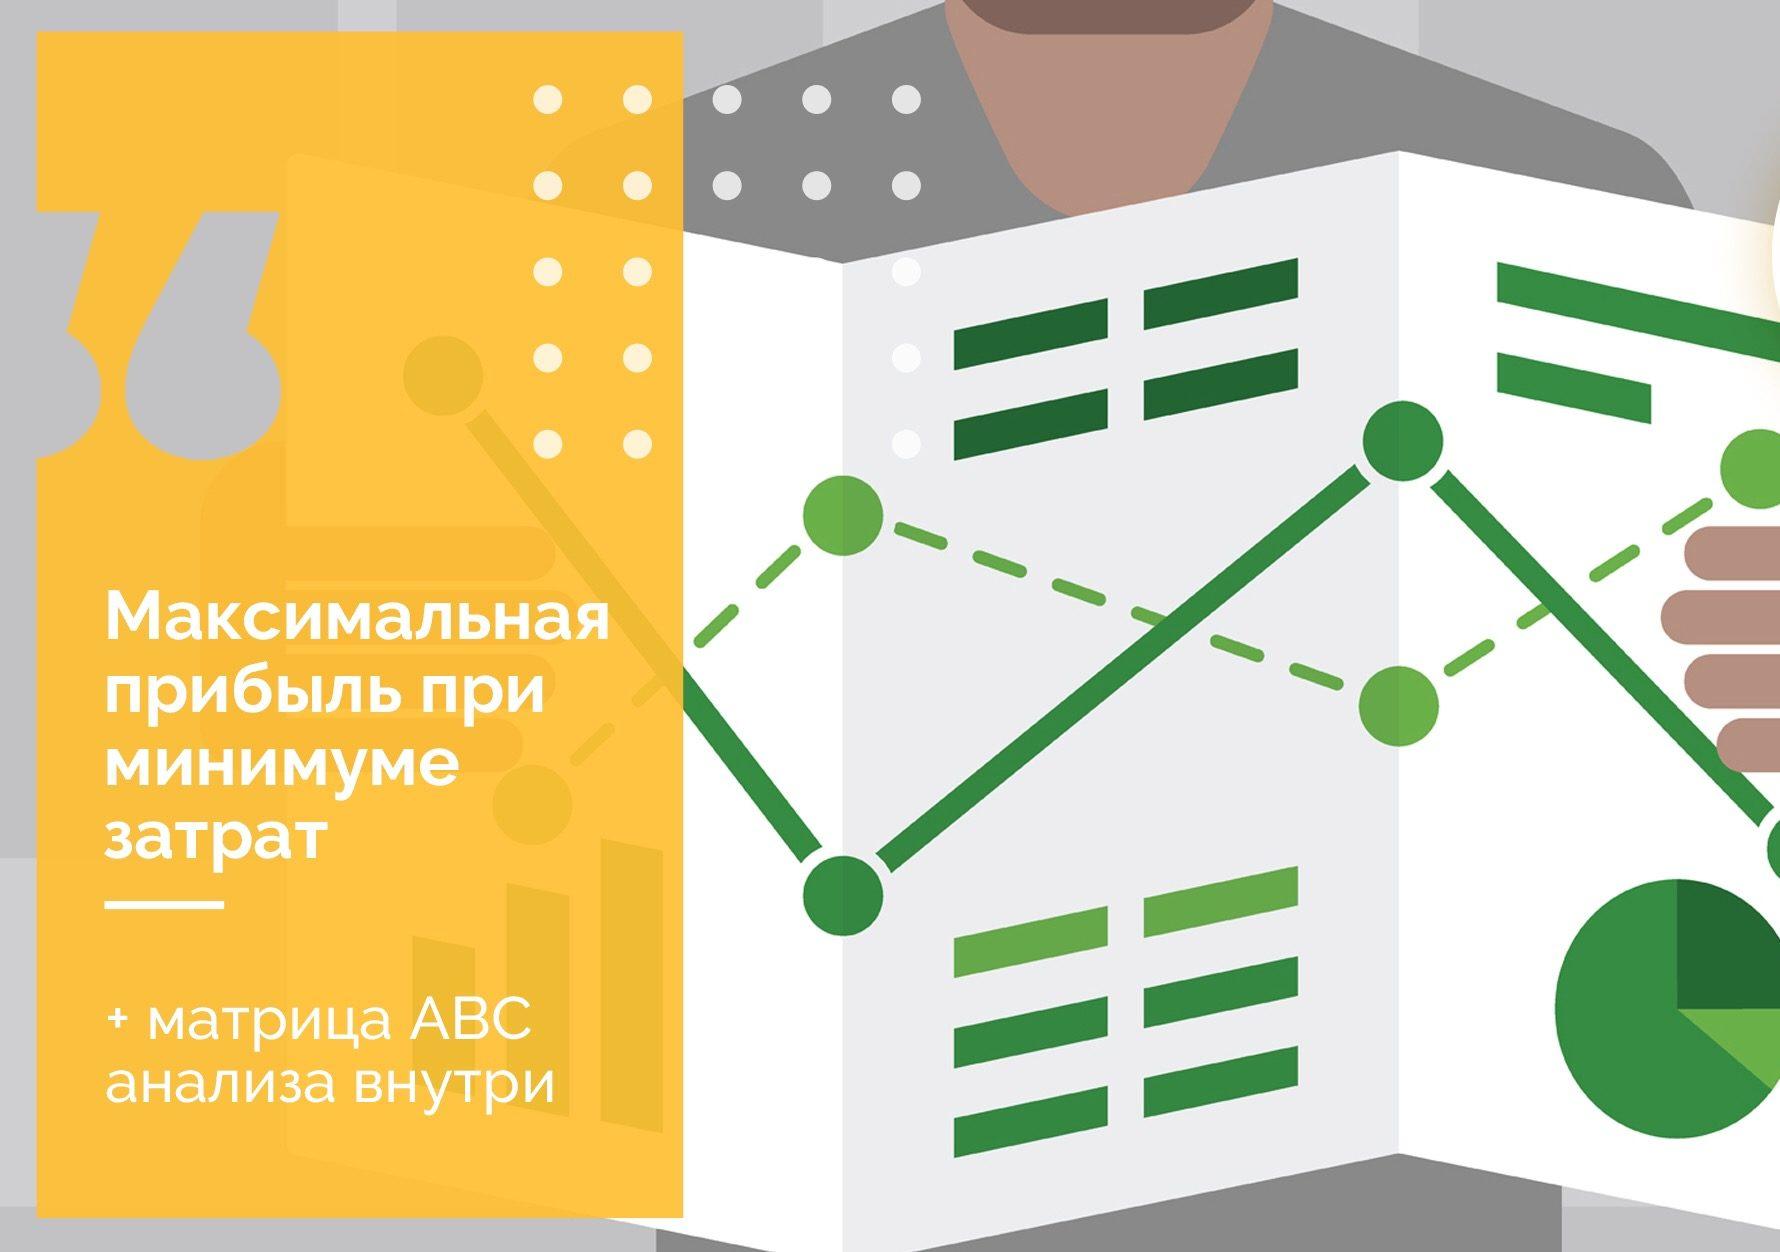 ABC-анализ